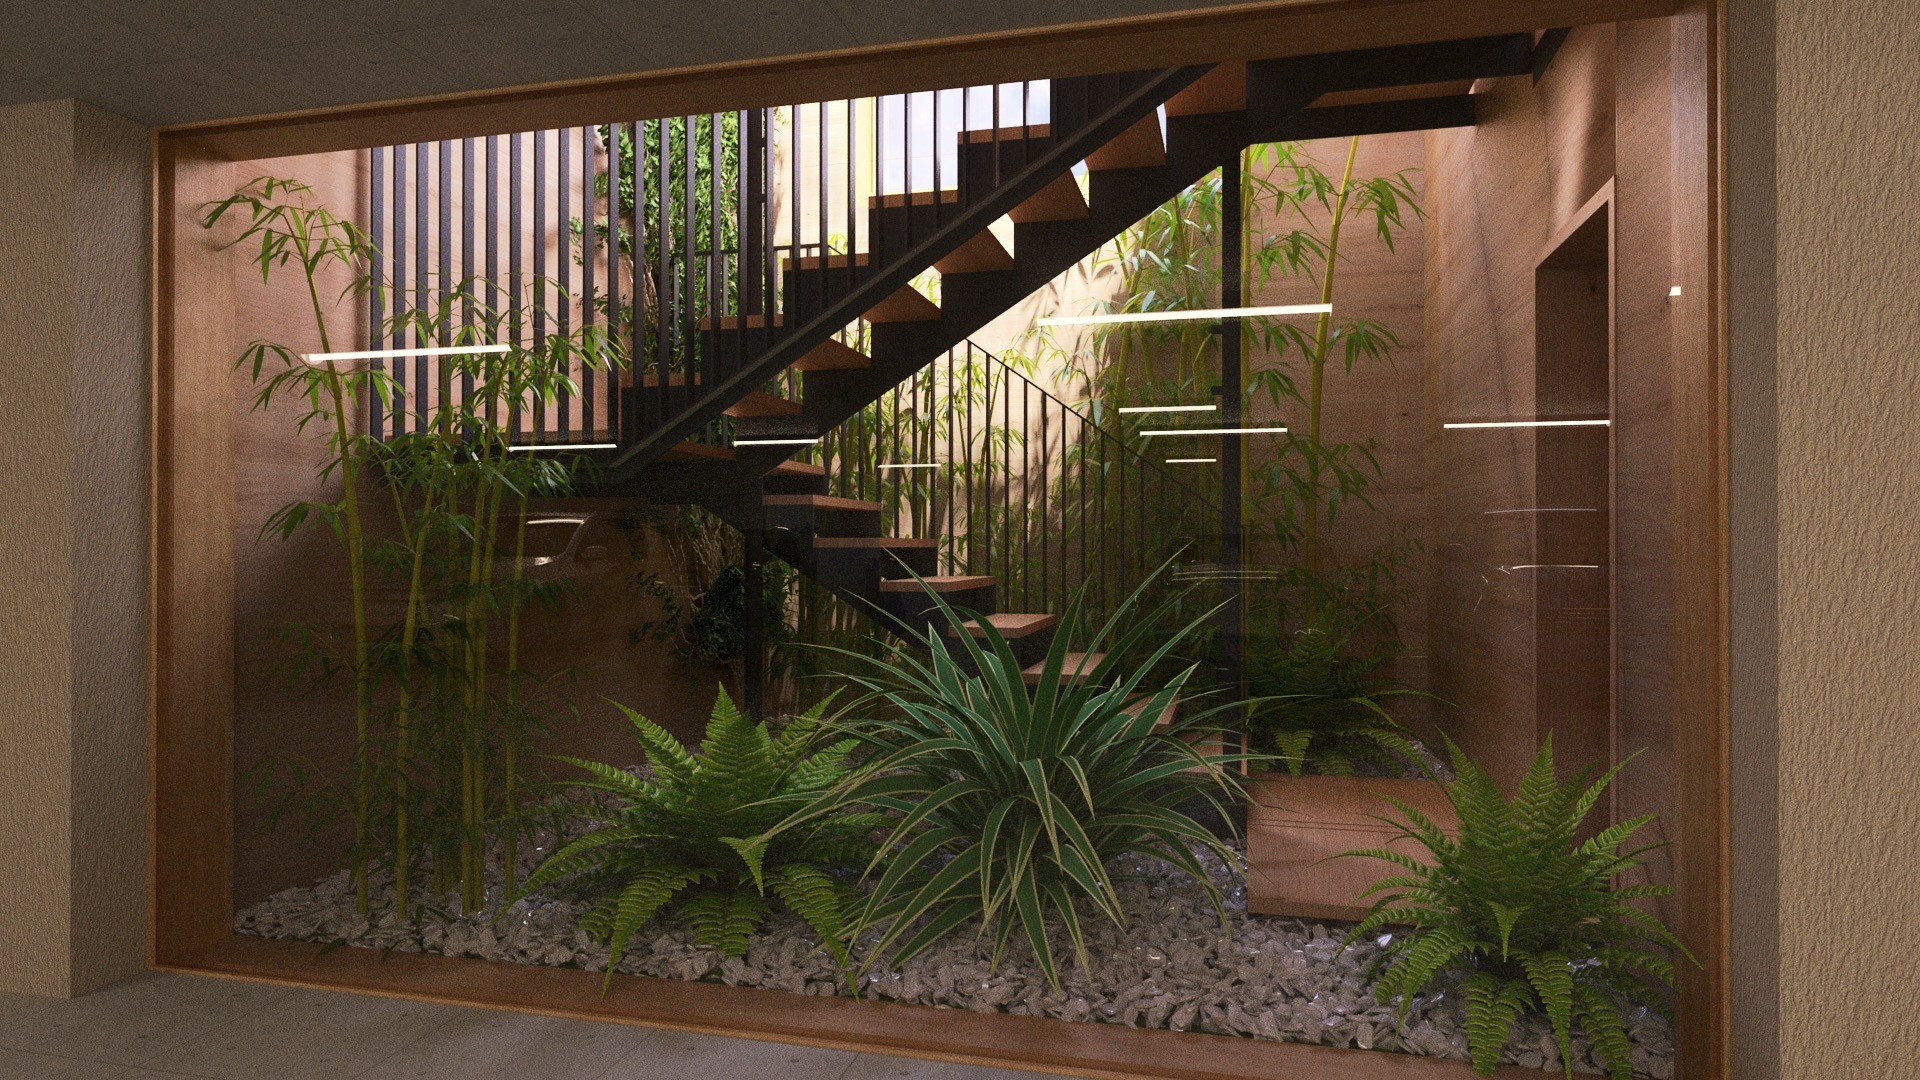 Duane kemp 25 a1309 villas portier 3d staircase garage garage bottom stairwell b2 post 02